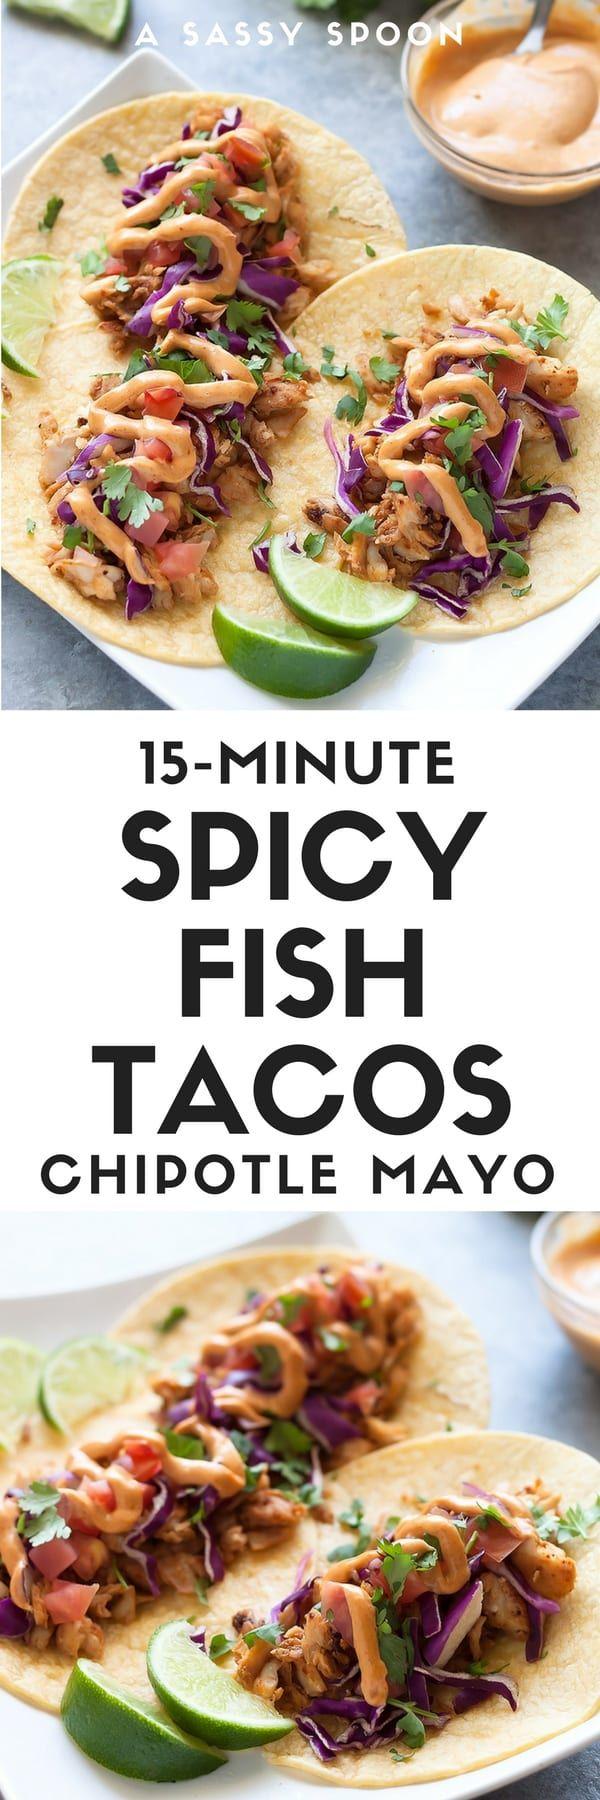 15 Minute Spicy Fish Taco Recipe Healthy Fish Tacos Spicy Fish Tacos Food Recipes